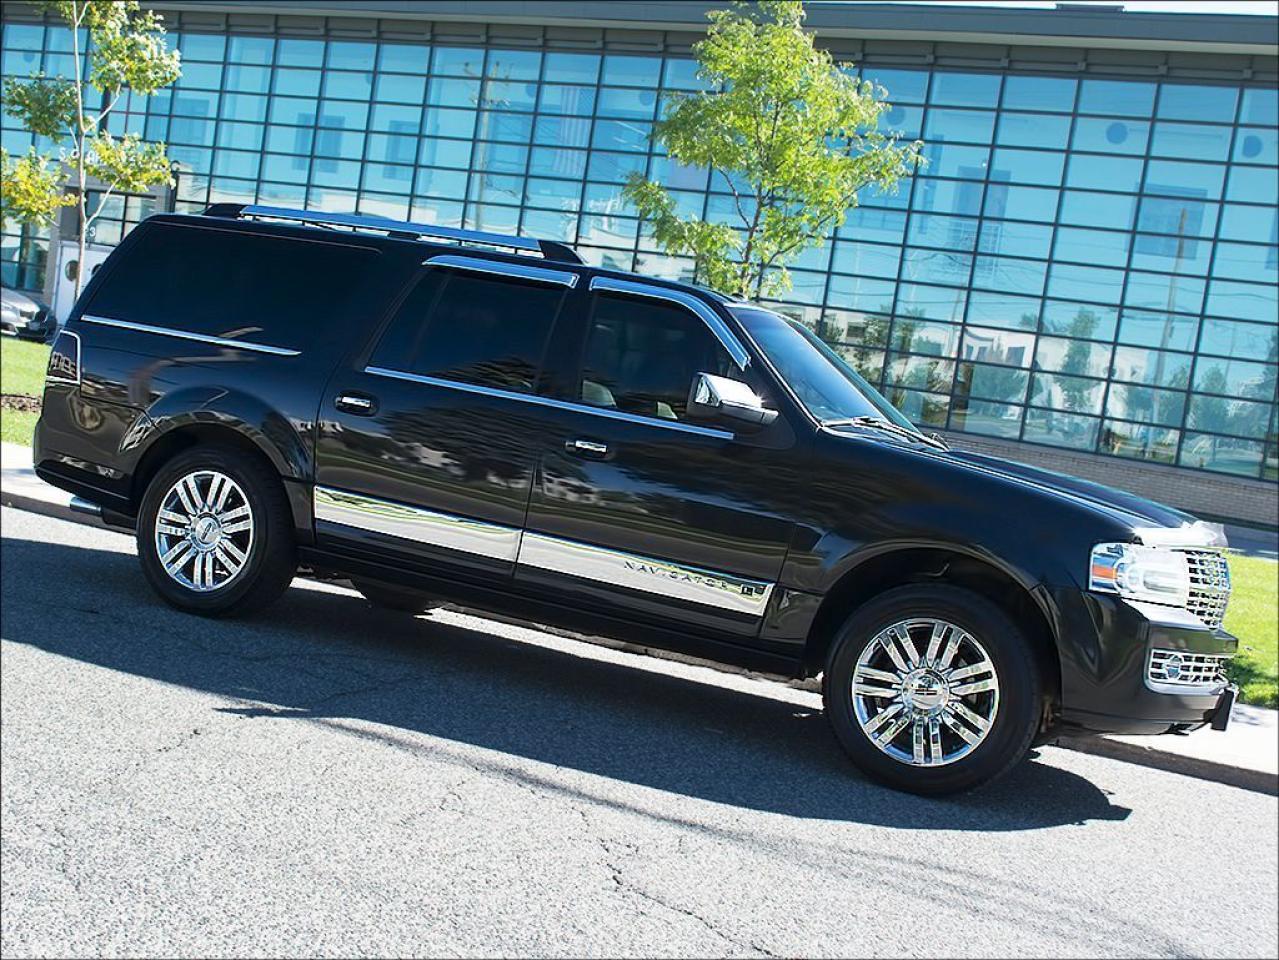 Photo of Black 2010 Lincoln Navigator